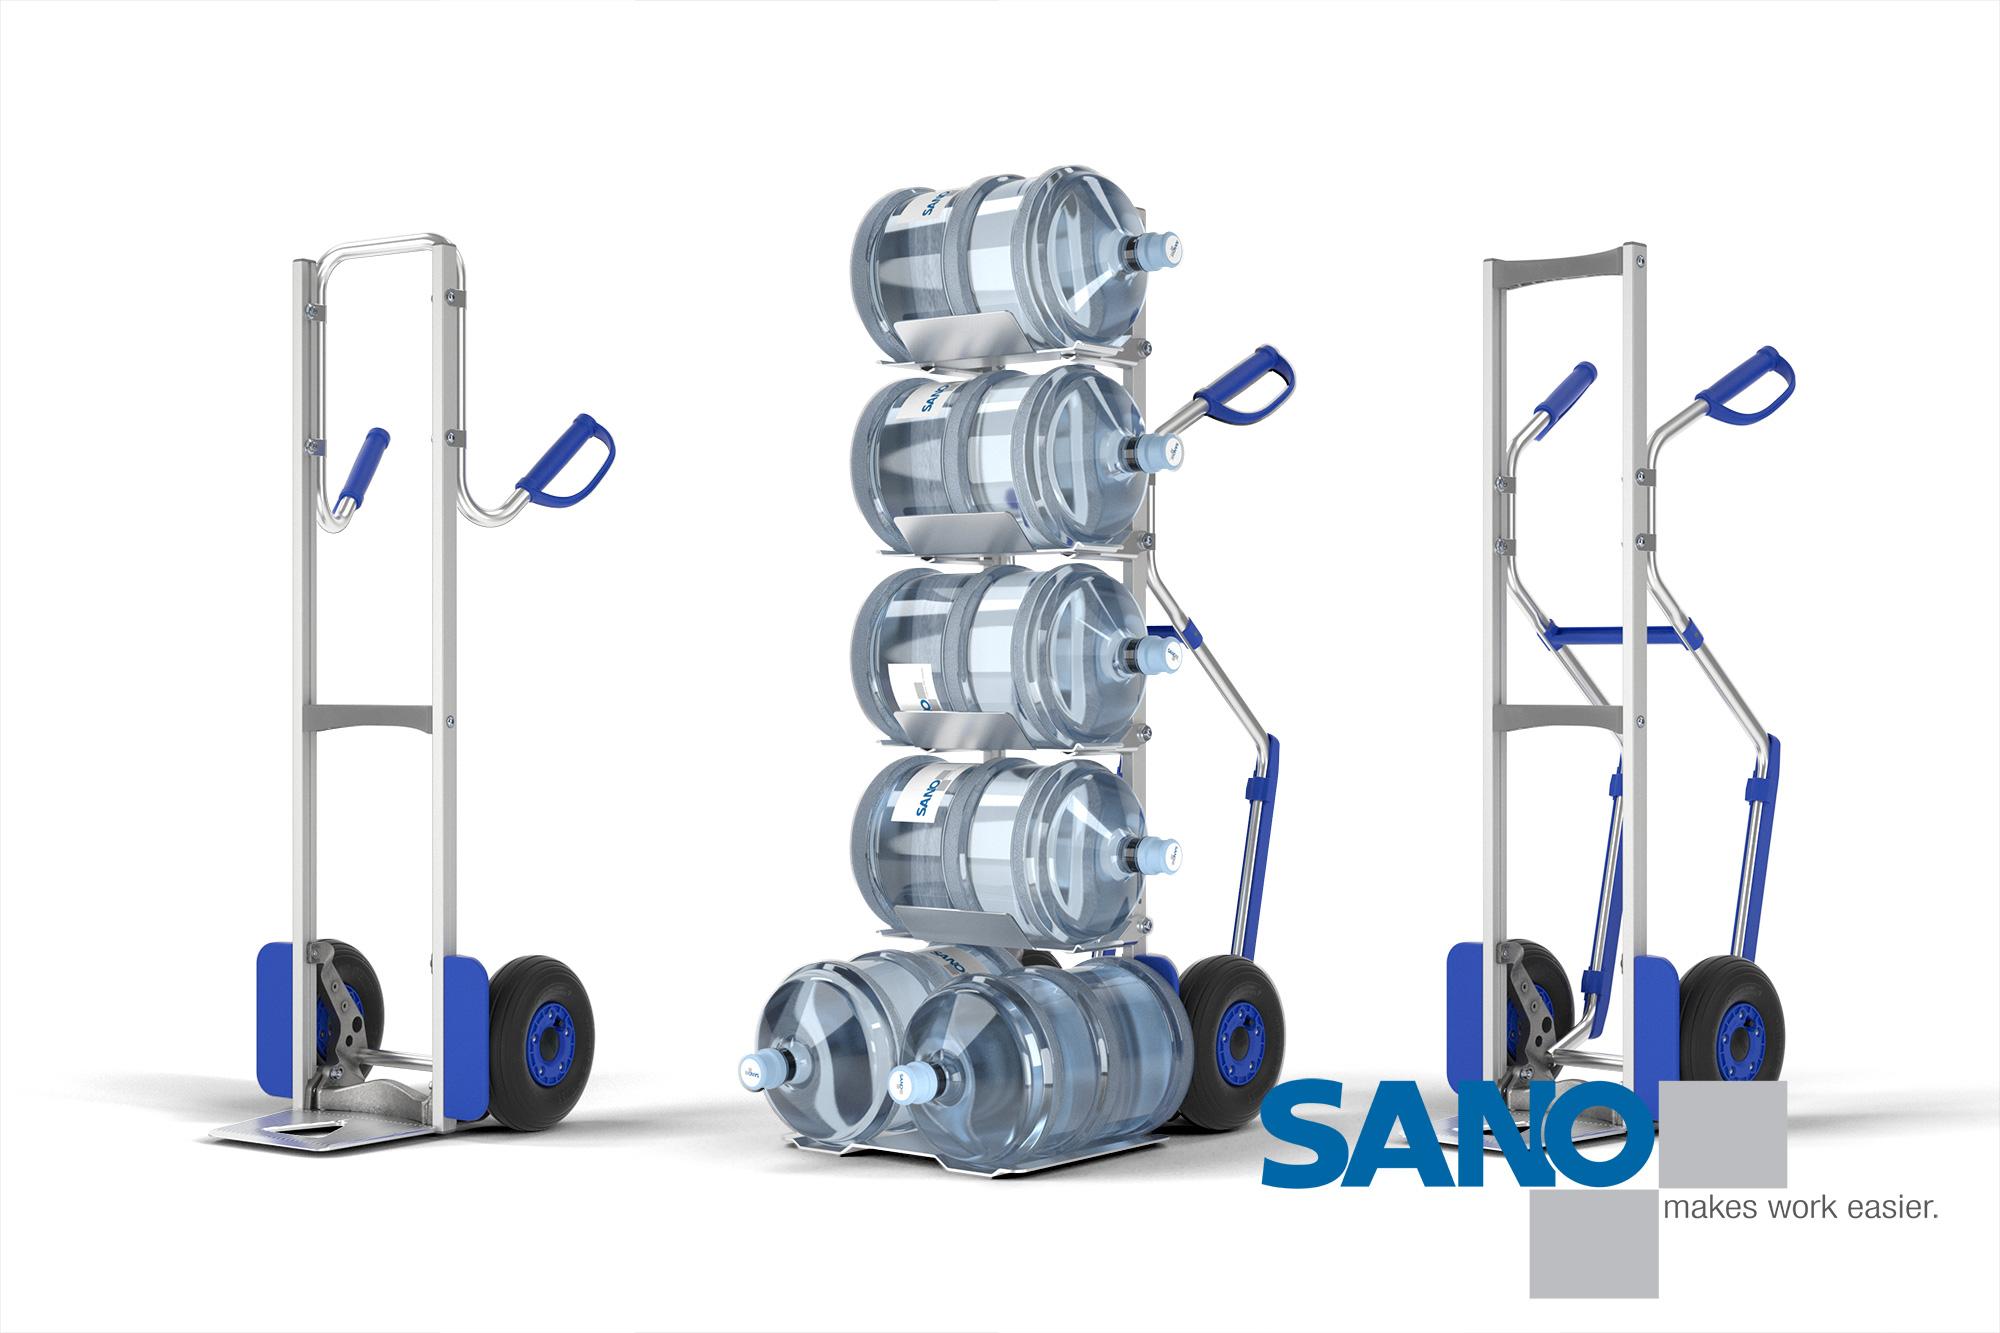 Produkt Rendering Sano Modulkar